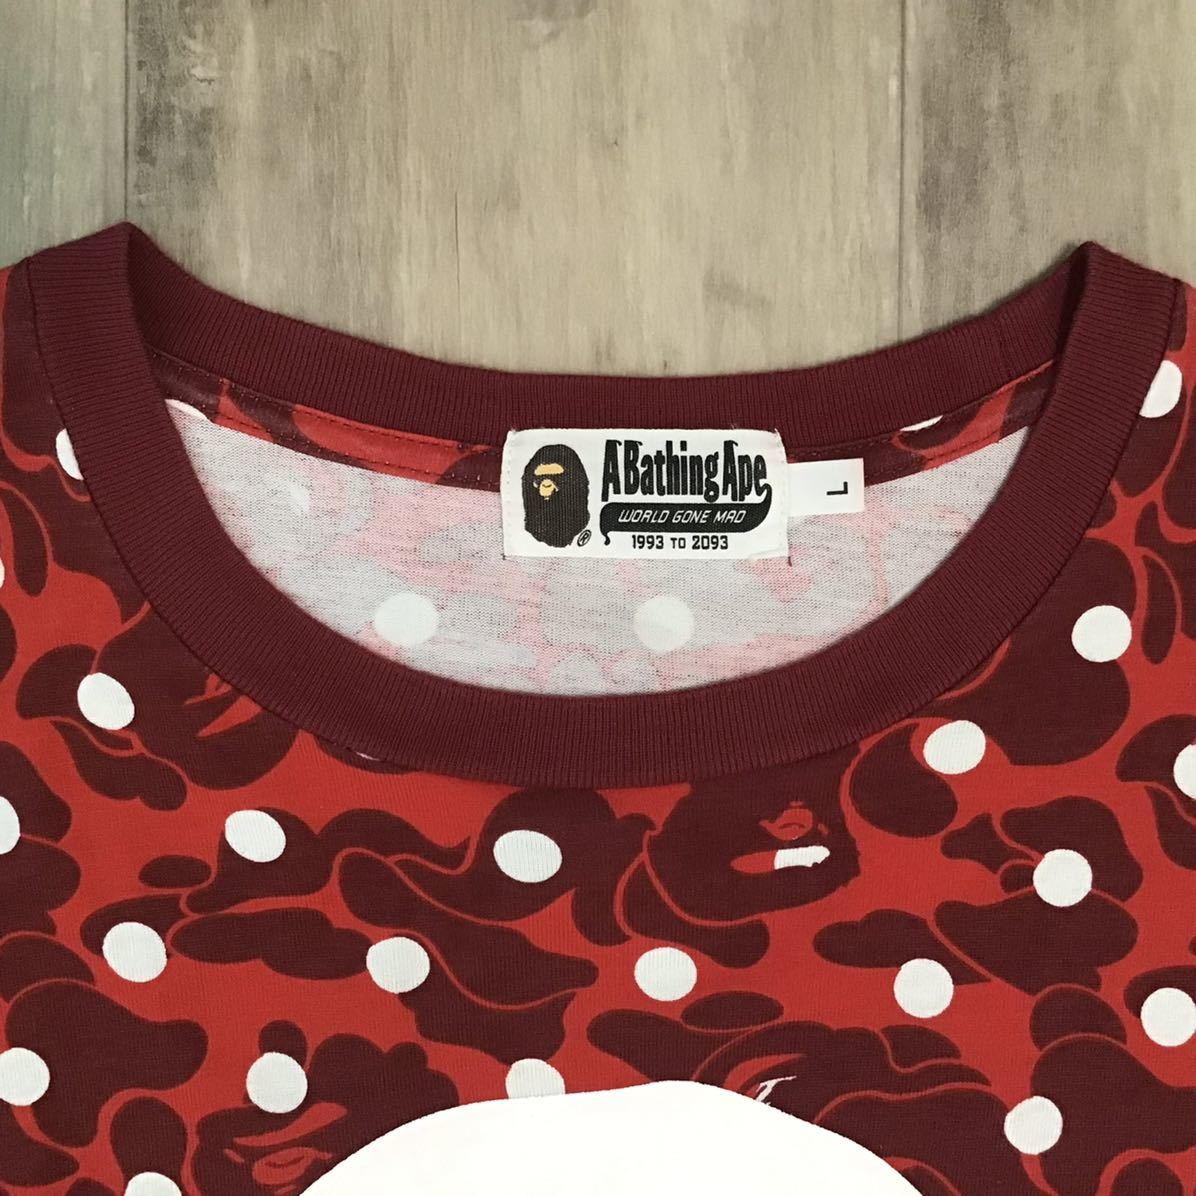 Dot camo BIG HEAD Tシャツ Lサイズ a bathing ape BAPE エイプ ベイプ アベイシングエイプ 迷彩 red レッドカモ a65